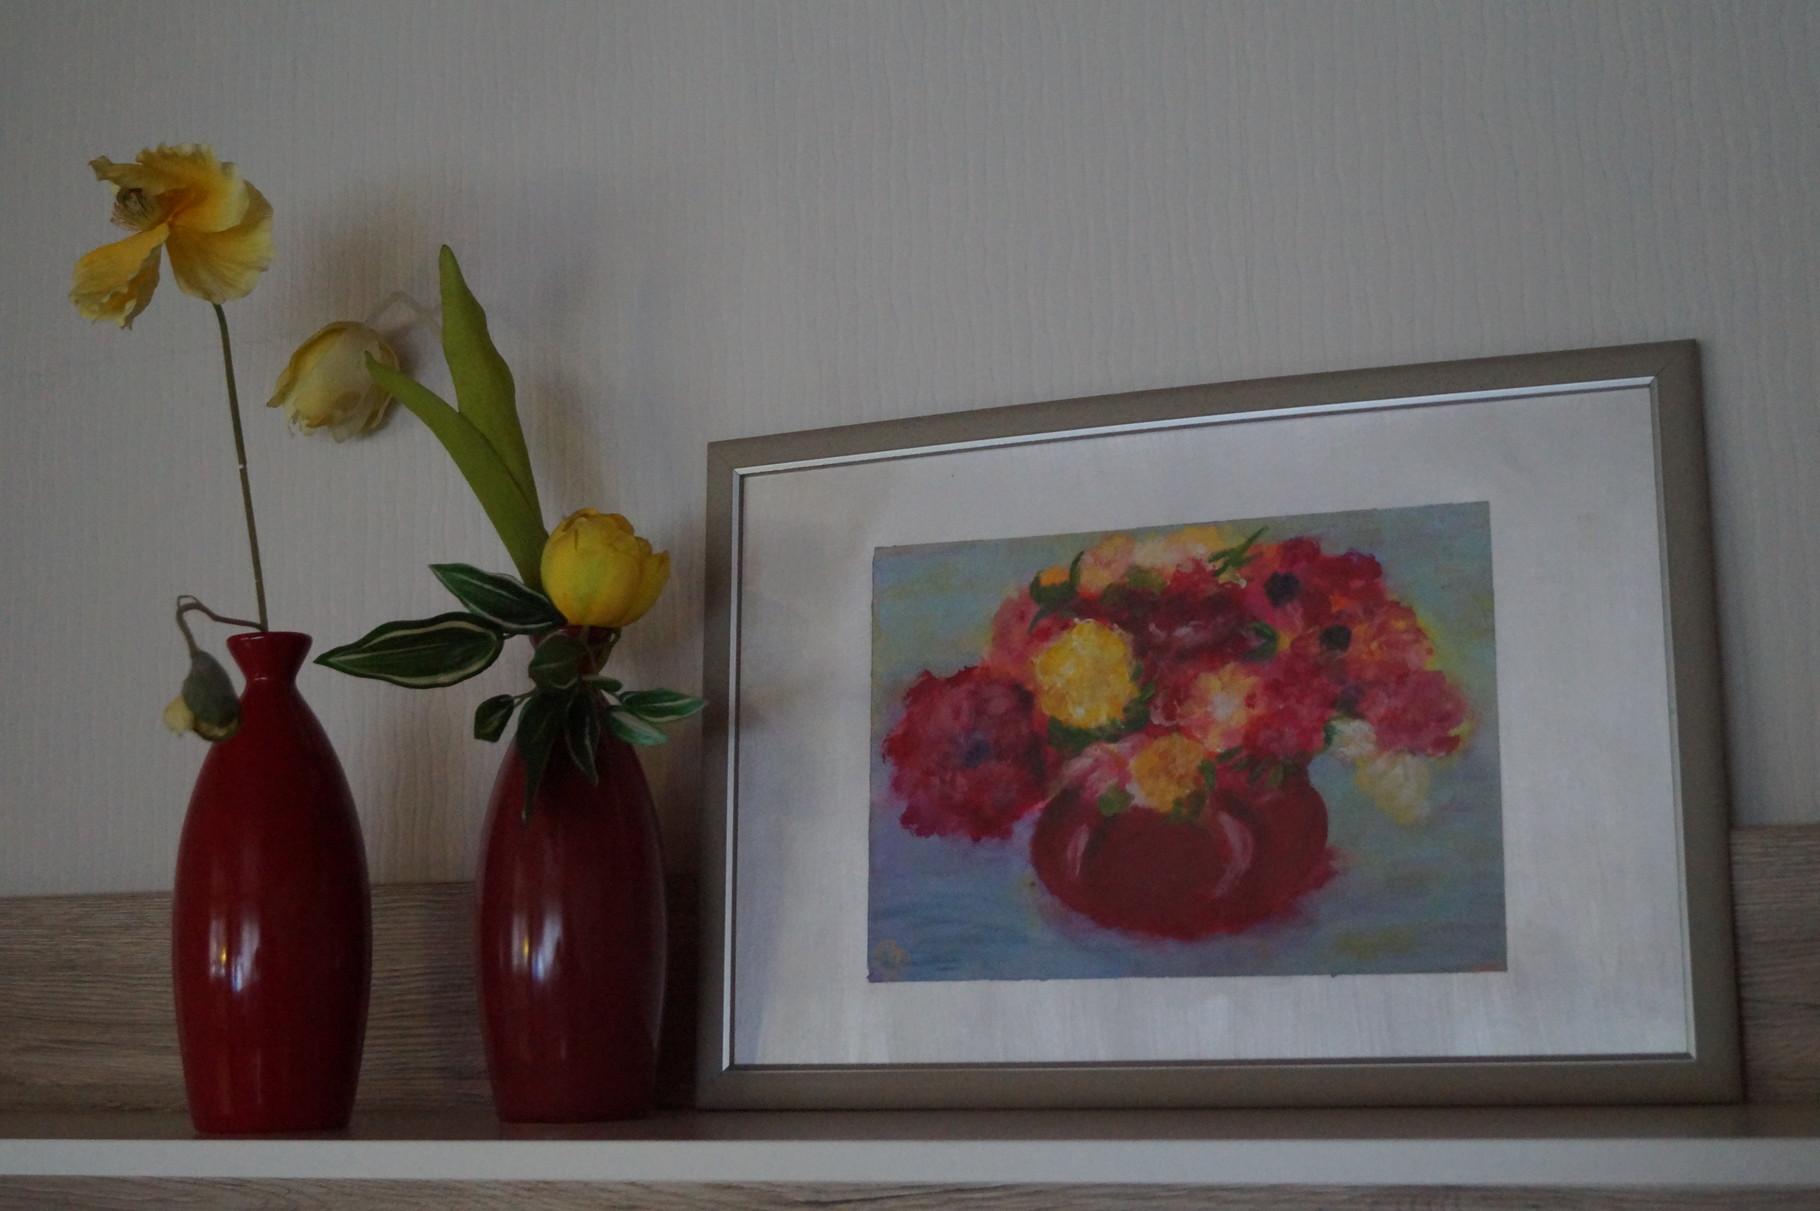 Blumenvase im Rahmen - 48 x 33 cm incl. Rahmen - Acryl